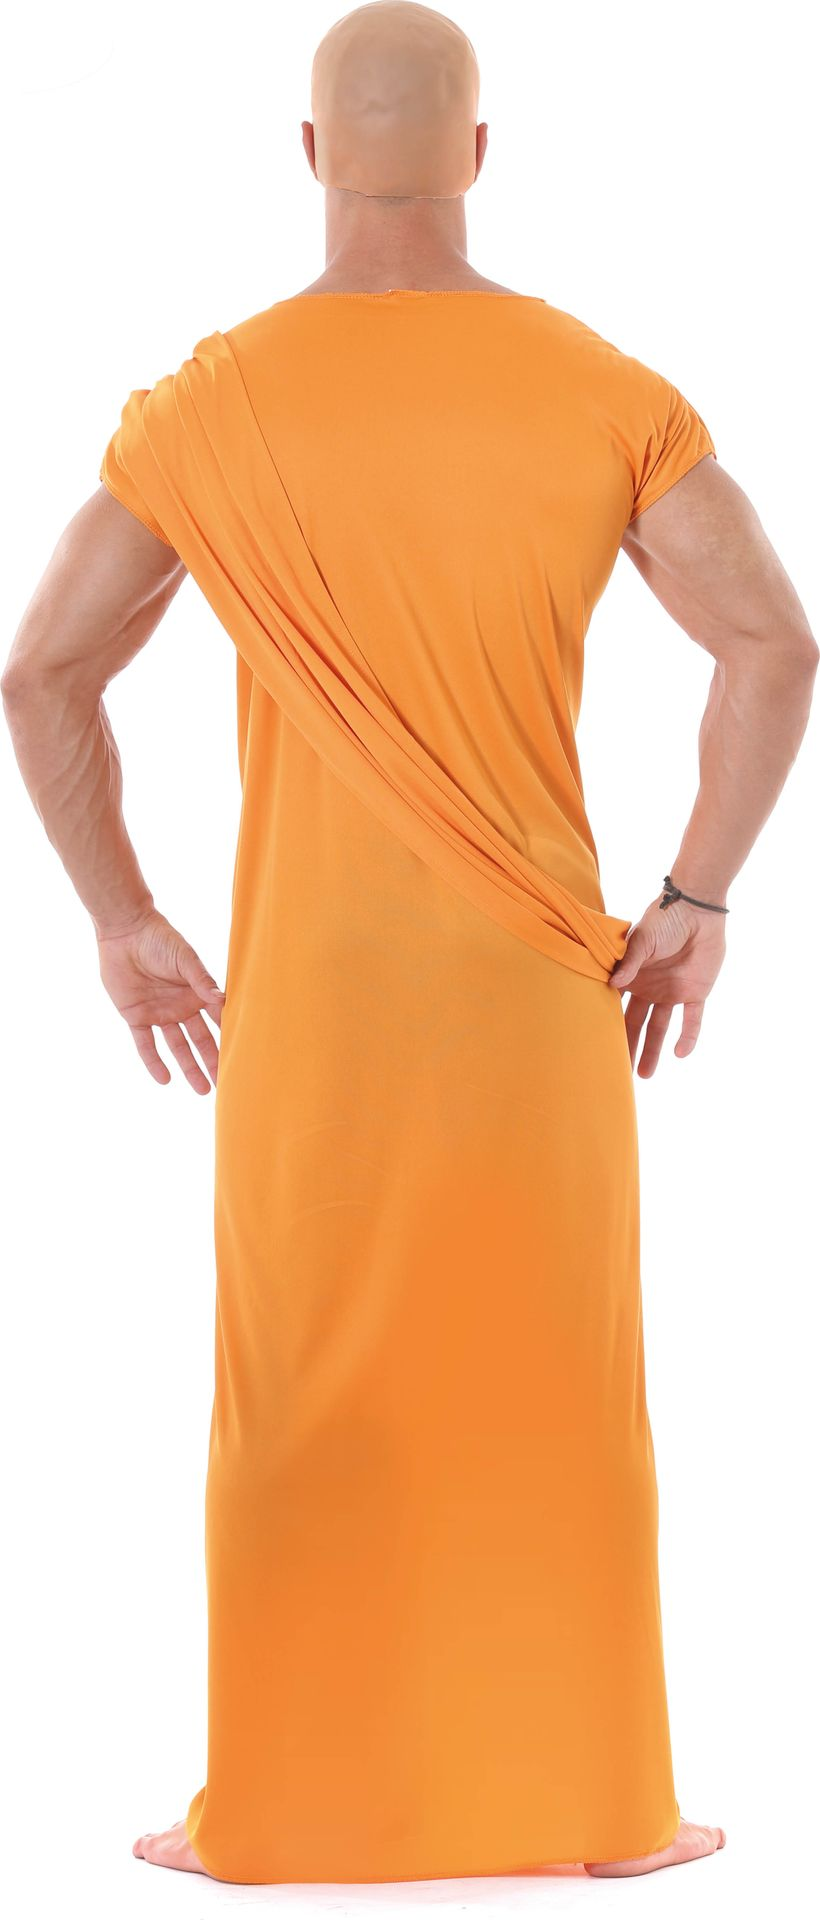 Hare Krishna kostuum